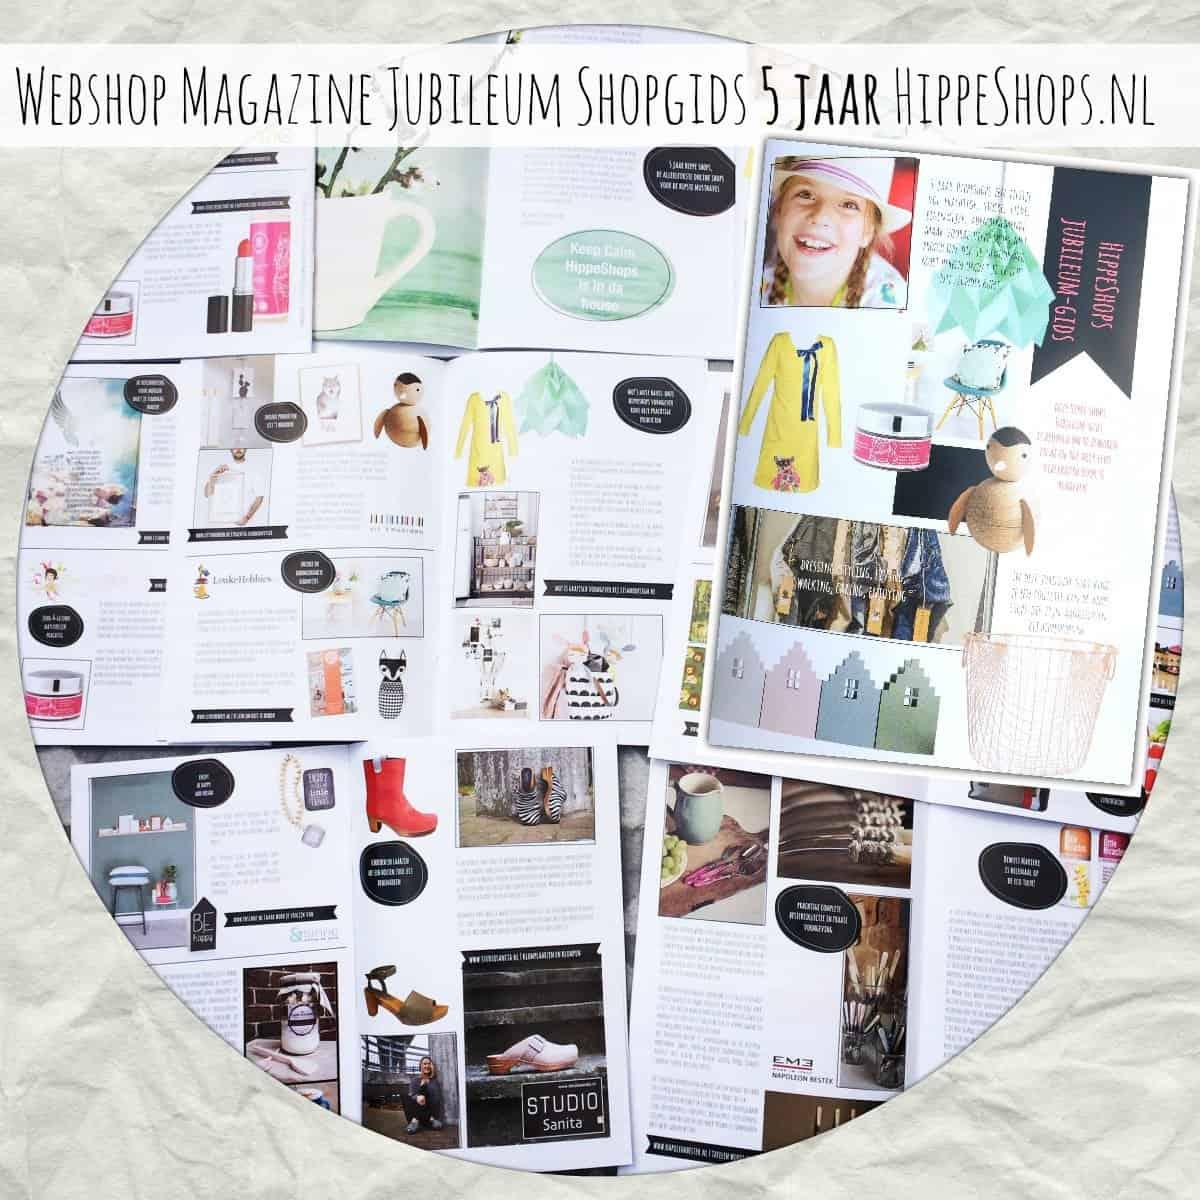 webshopmagazine-5jaar-hippeshops